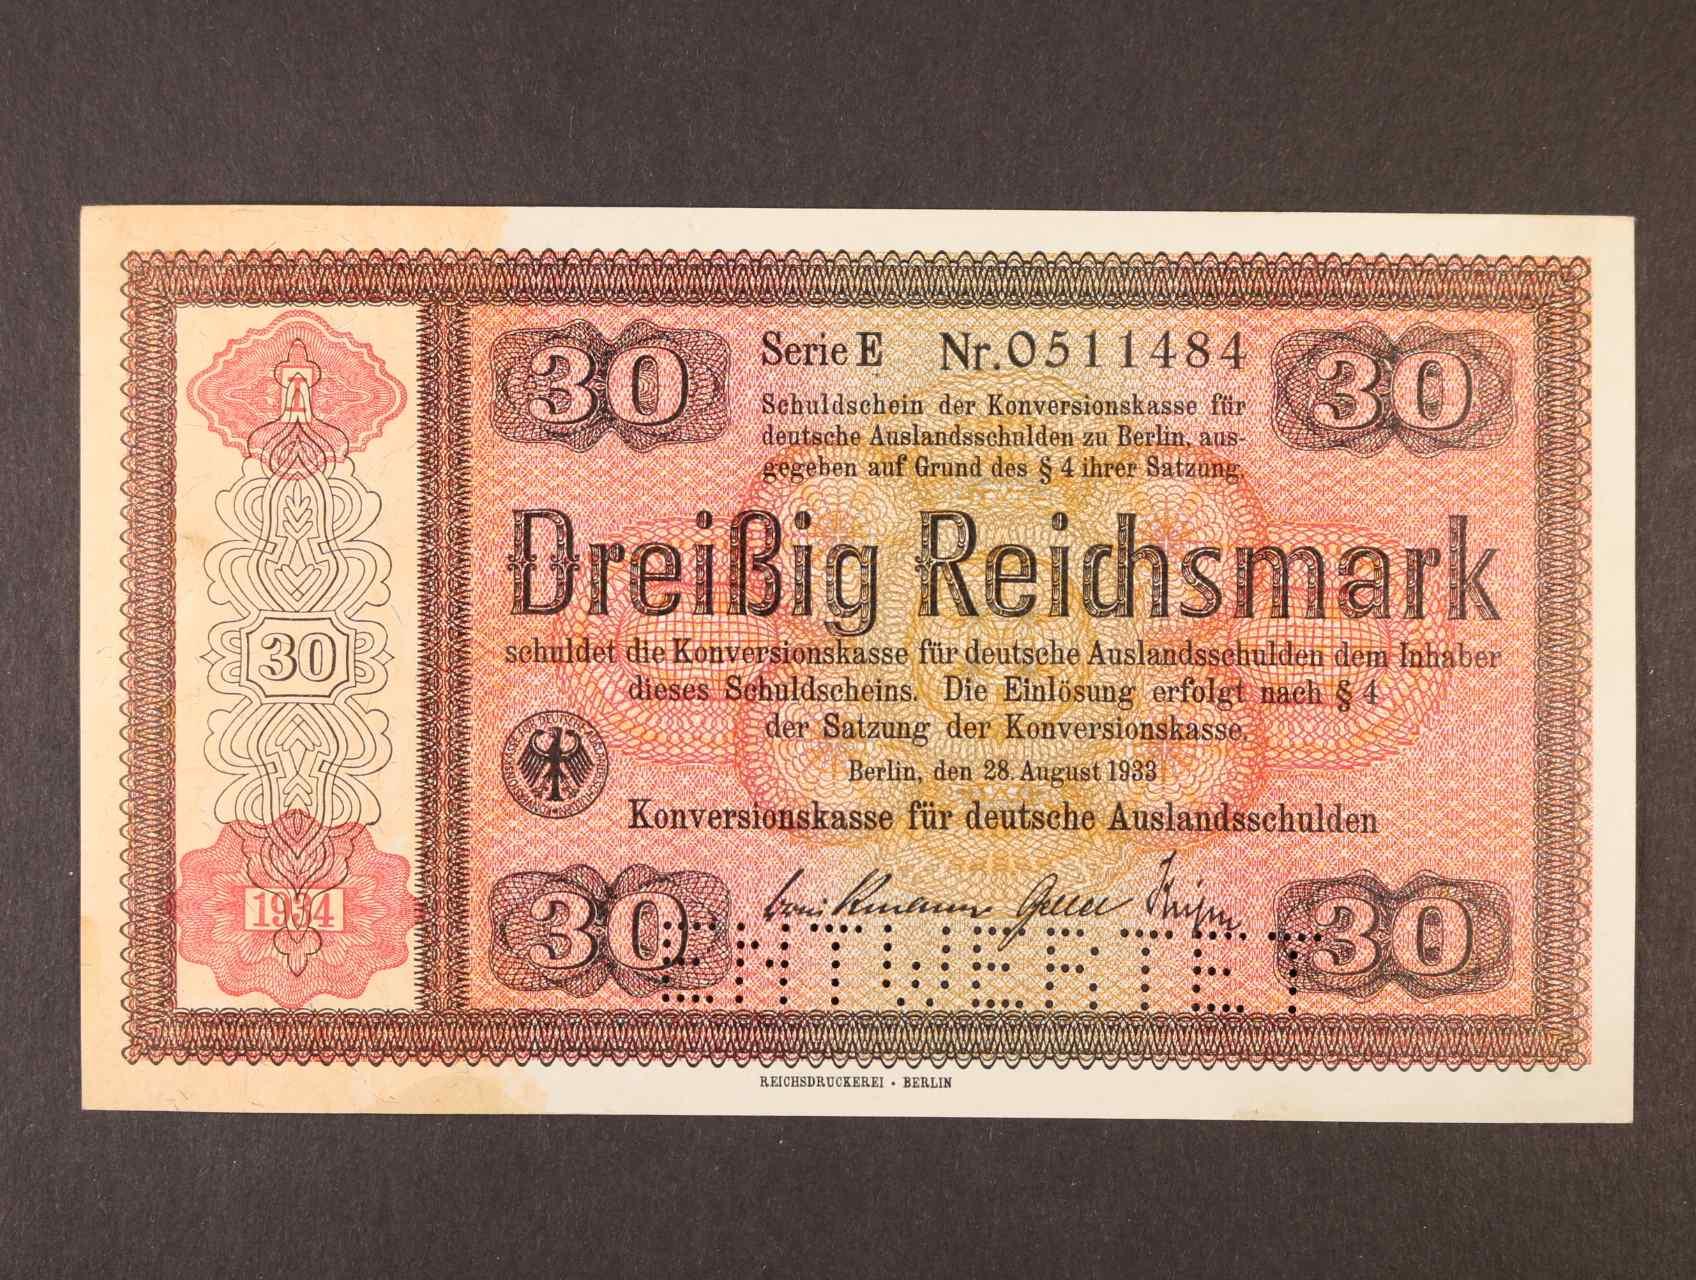 30 RM 28.8.1933 série E s přetiskem 1934  Konversionskassenschein s perforace ENTWERTET, Ro. 710E1